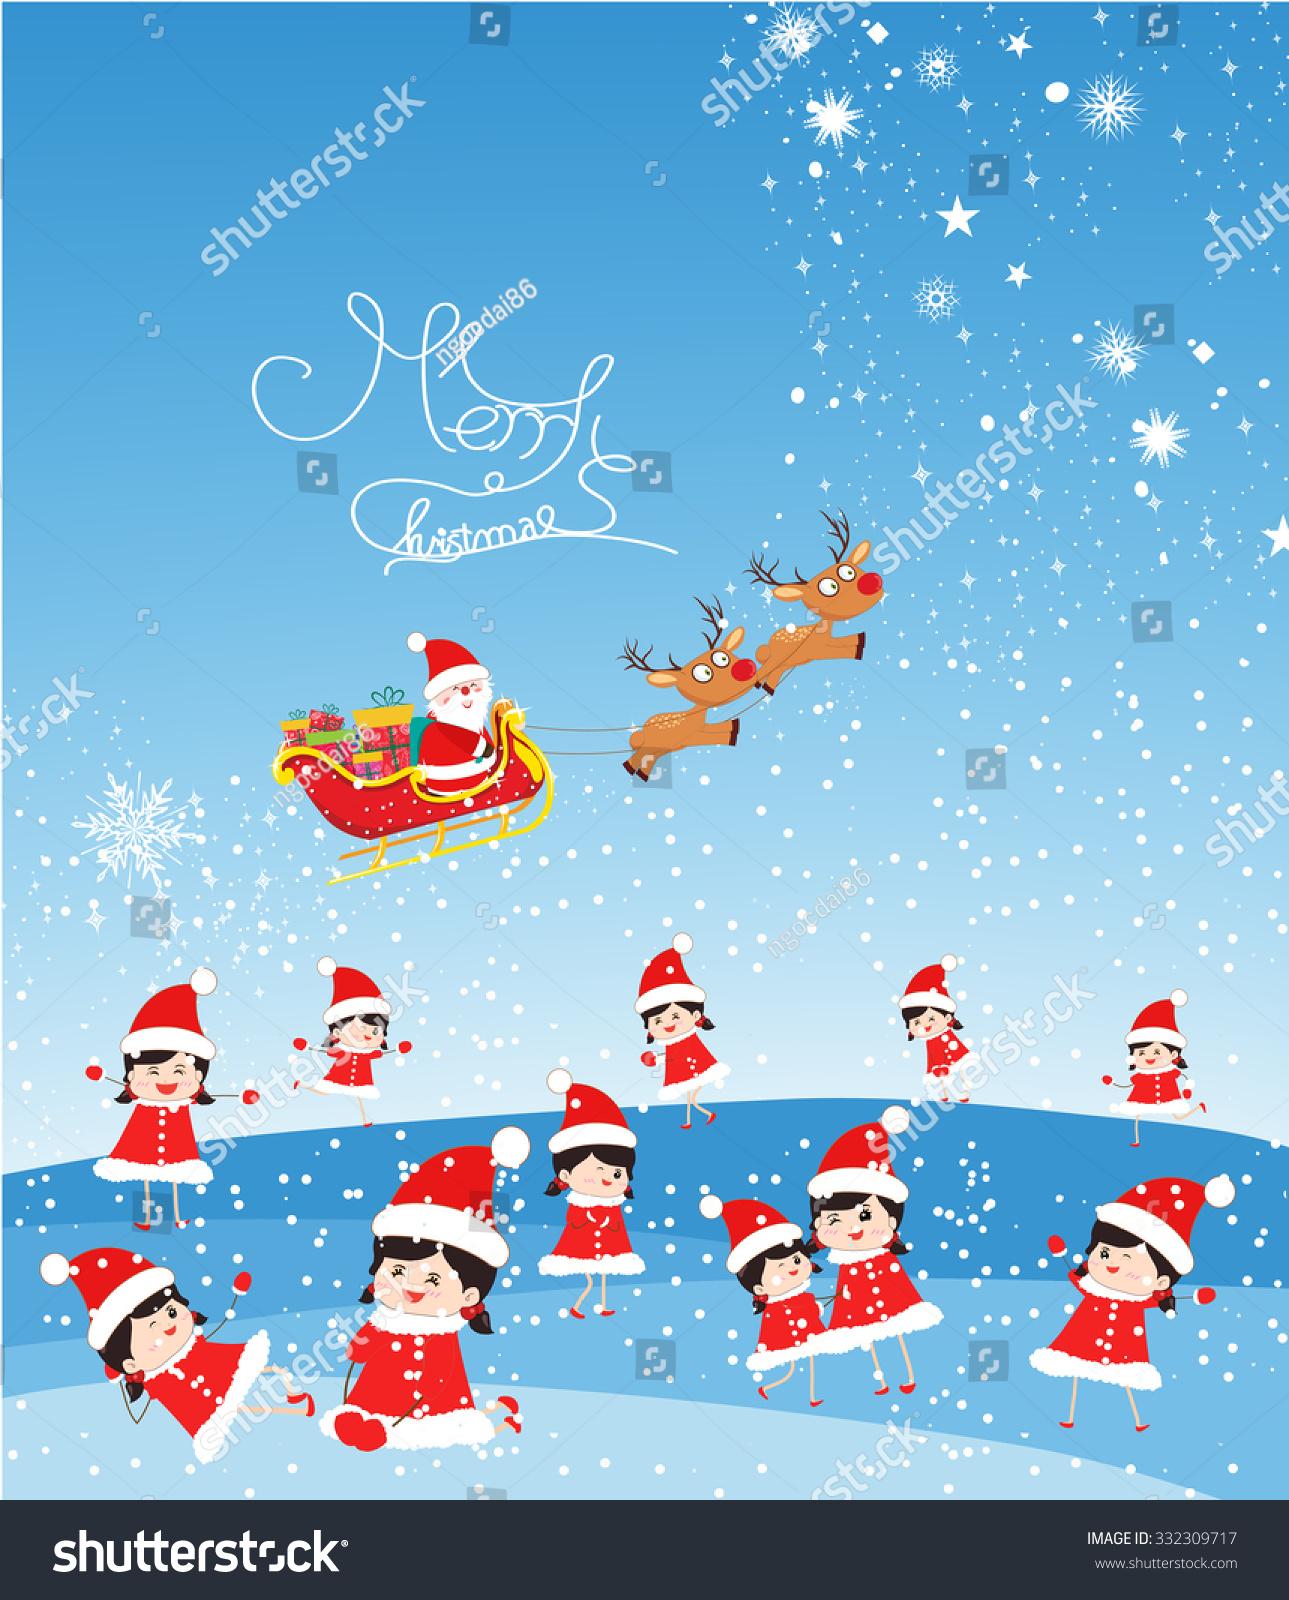 Merry Christmas Funny Kids Santa Claus Stock Vector (Royalty Free ...